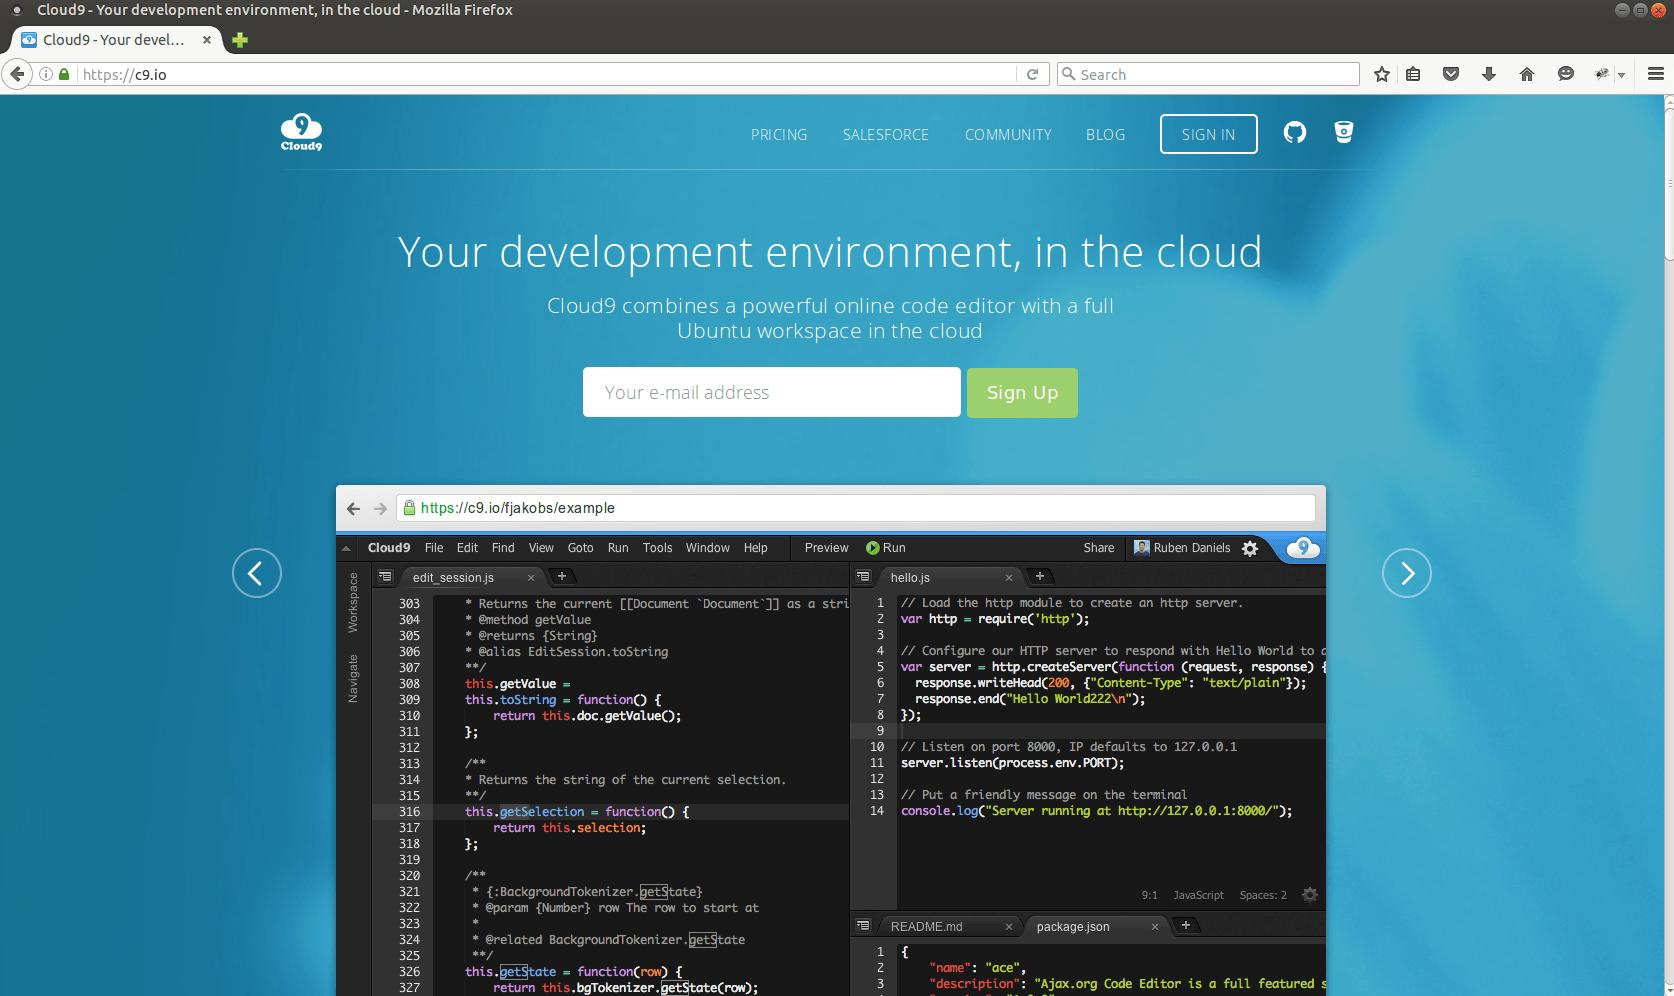 cloud9-website.png